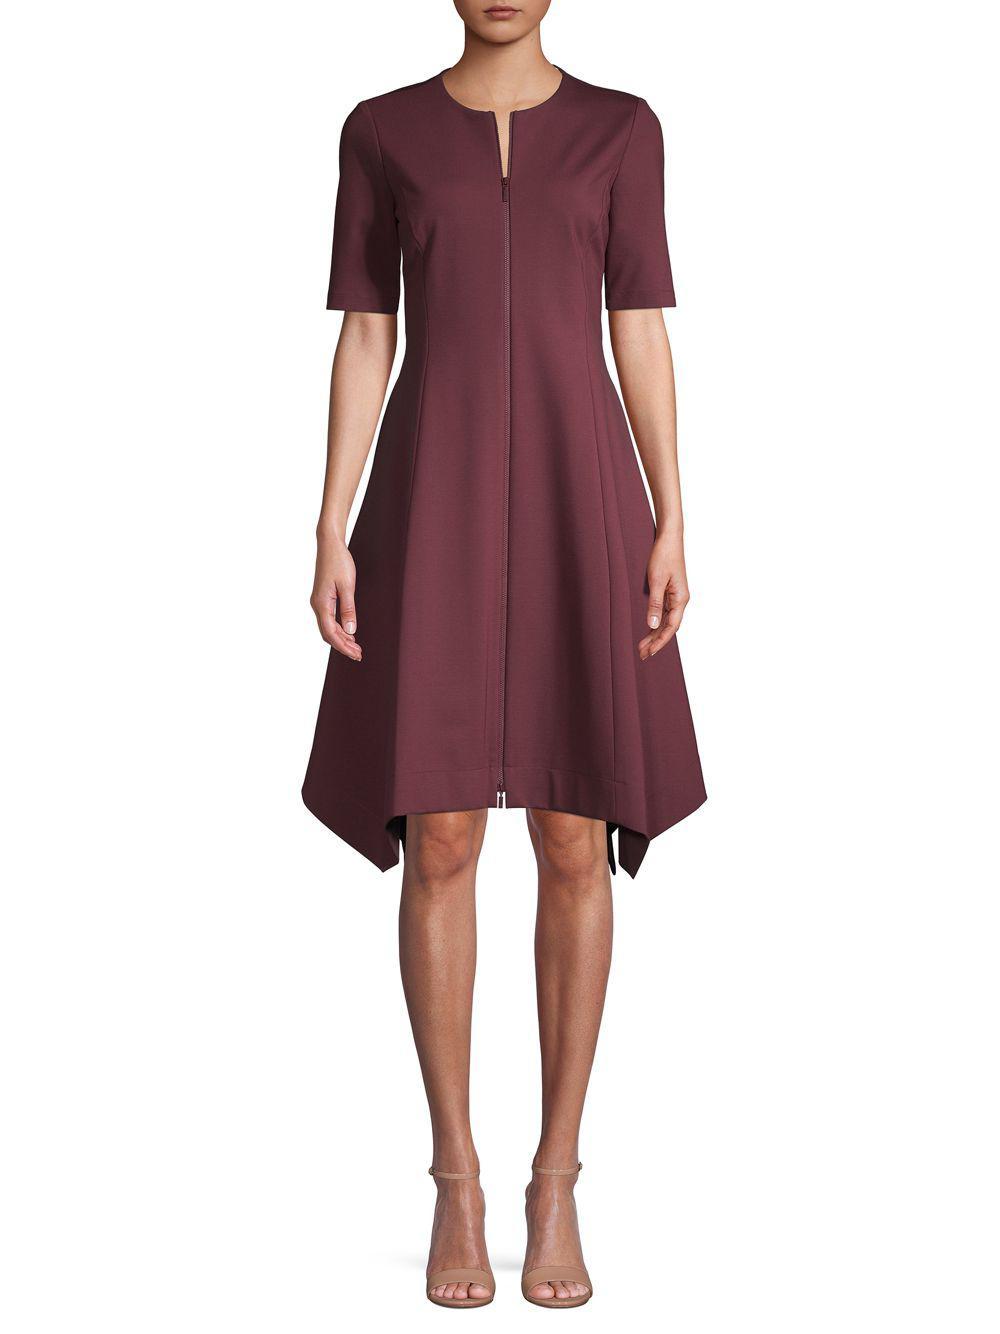 1d0e2e215aa30 Lyst - Lafayette 148 New York Short-sleeve Asymmetric A-line Dress ...